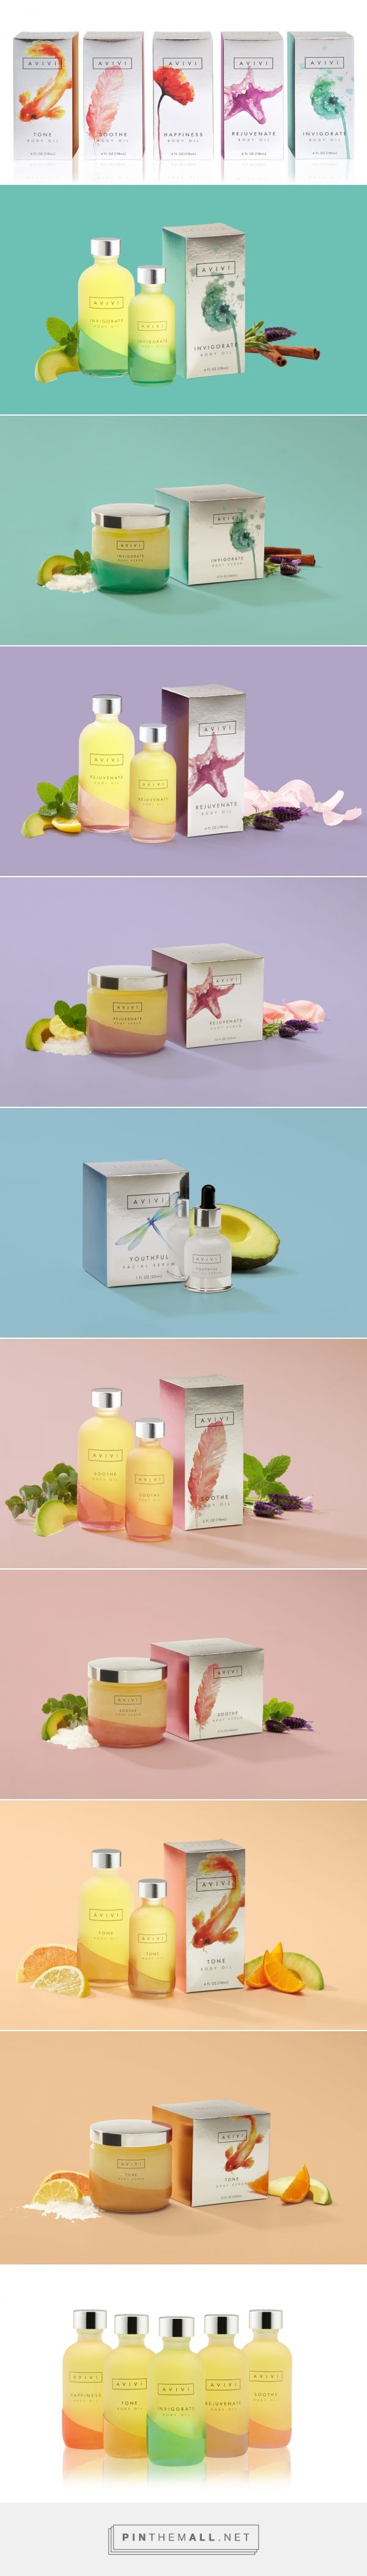 Avivi  cosmetics by MSLK